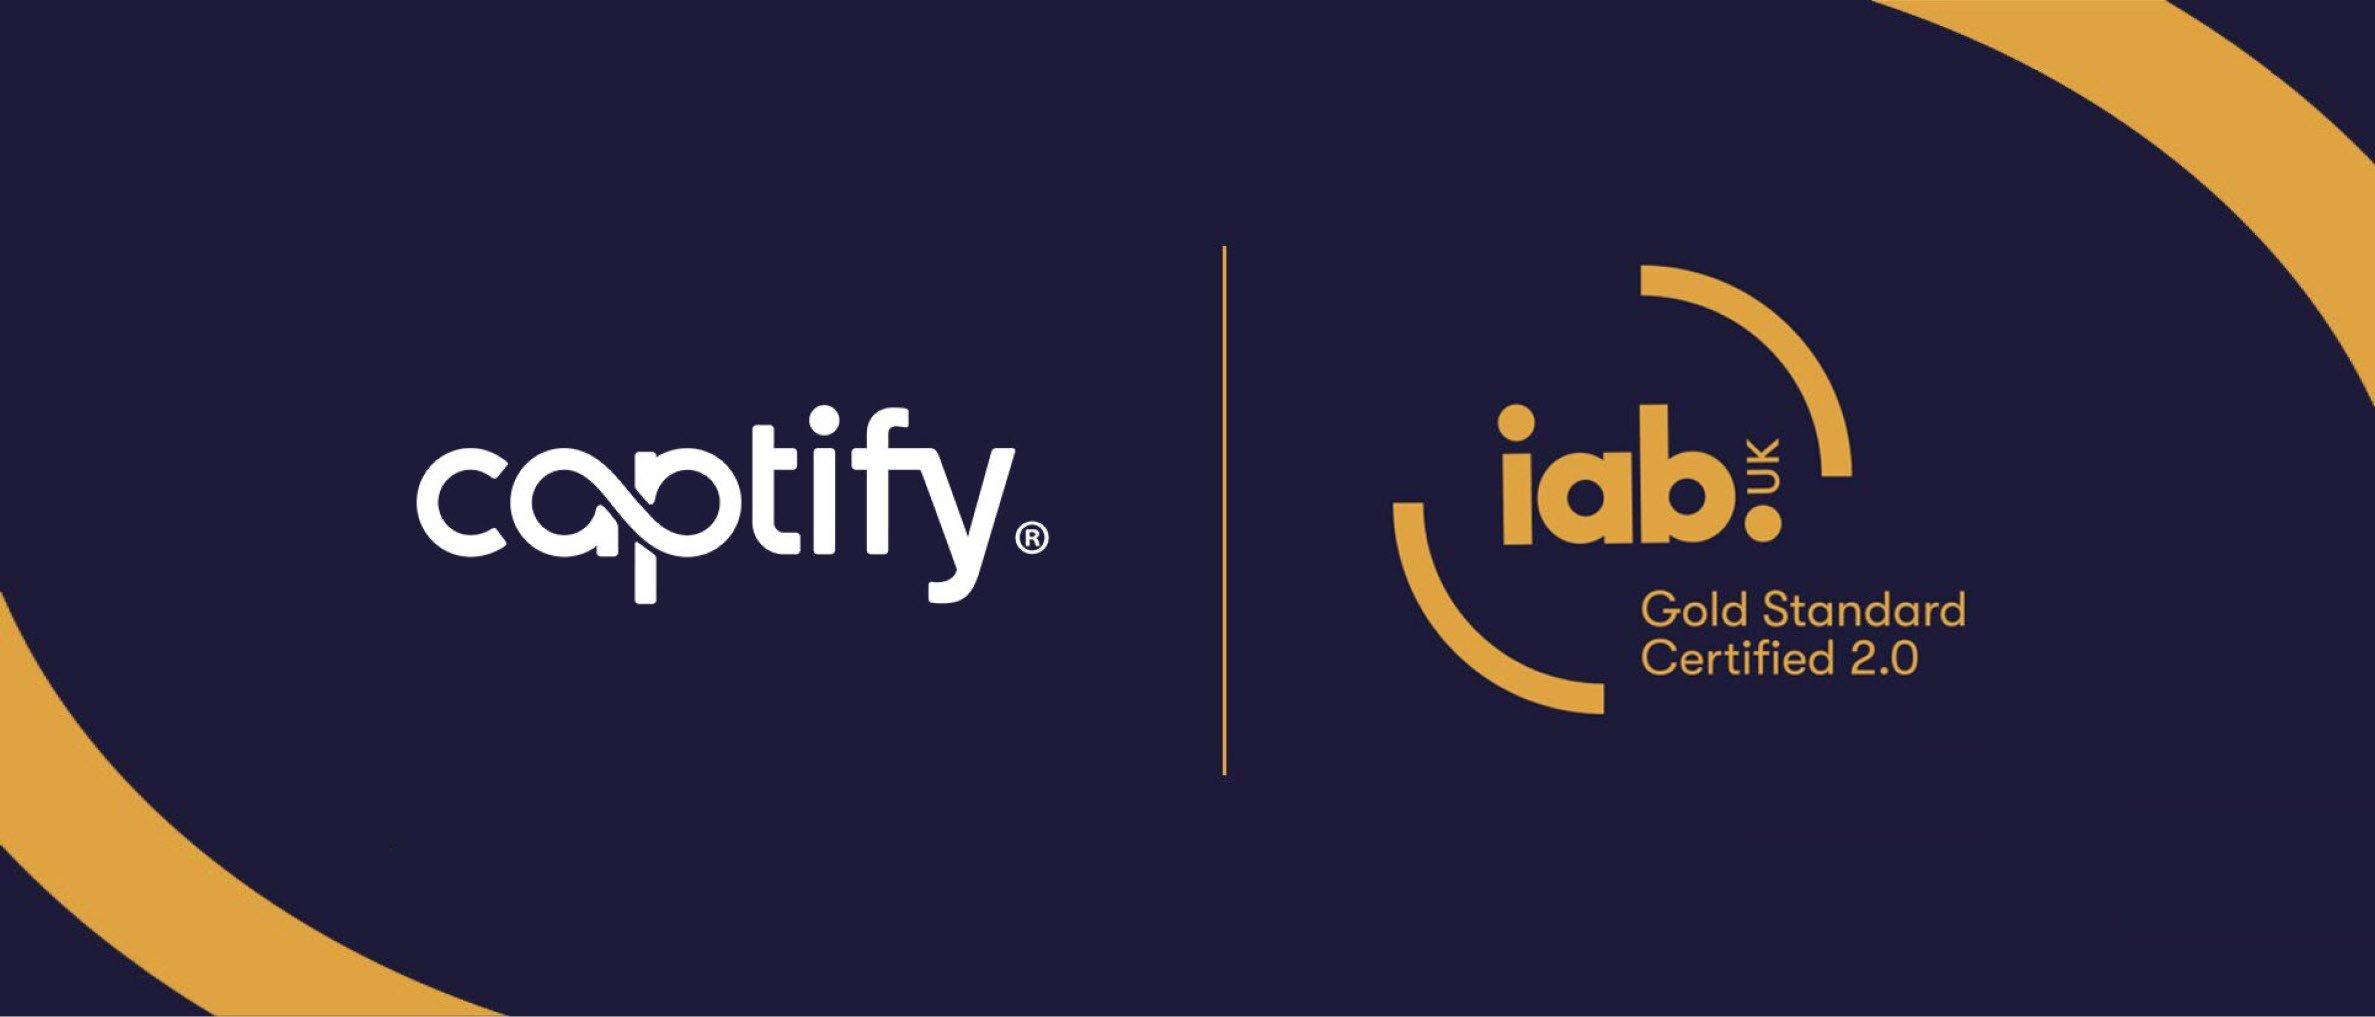 Captify Awarded IAB Gold Standard 2.0 Certification